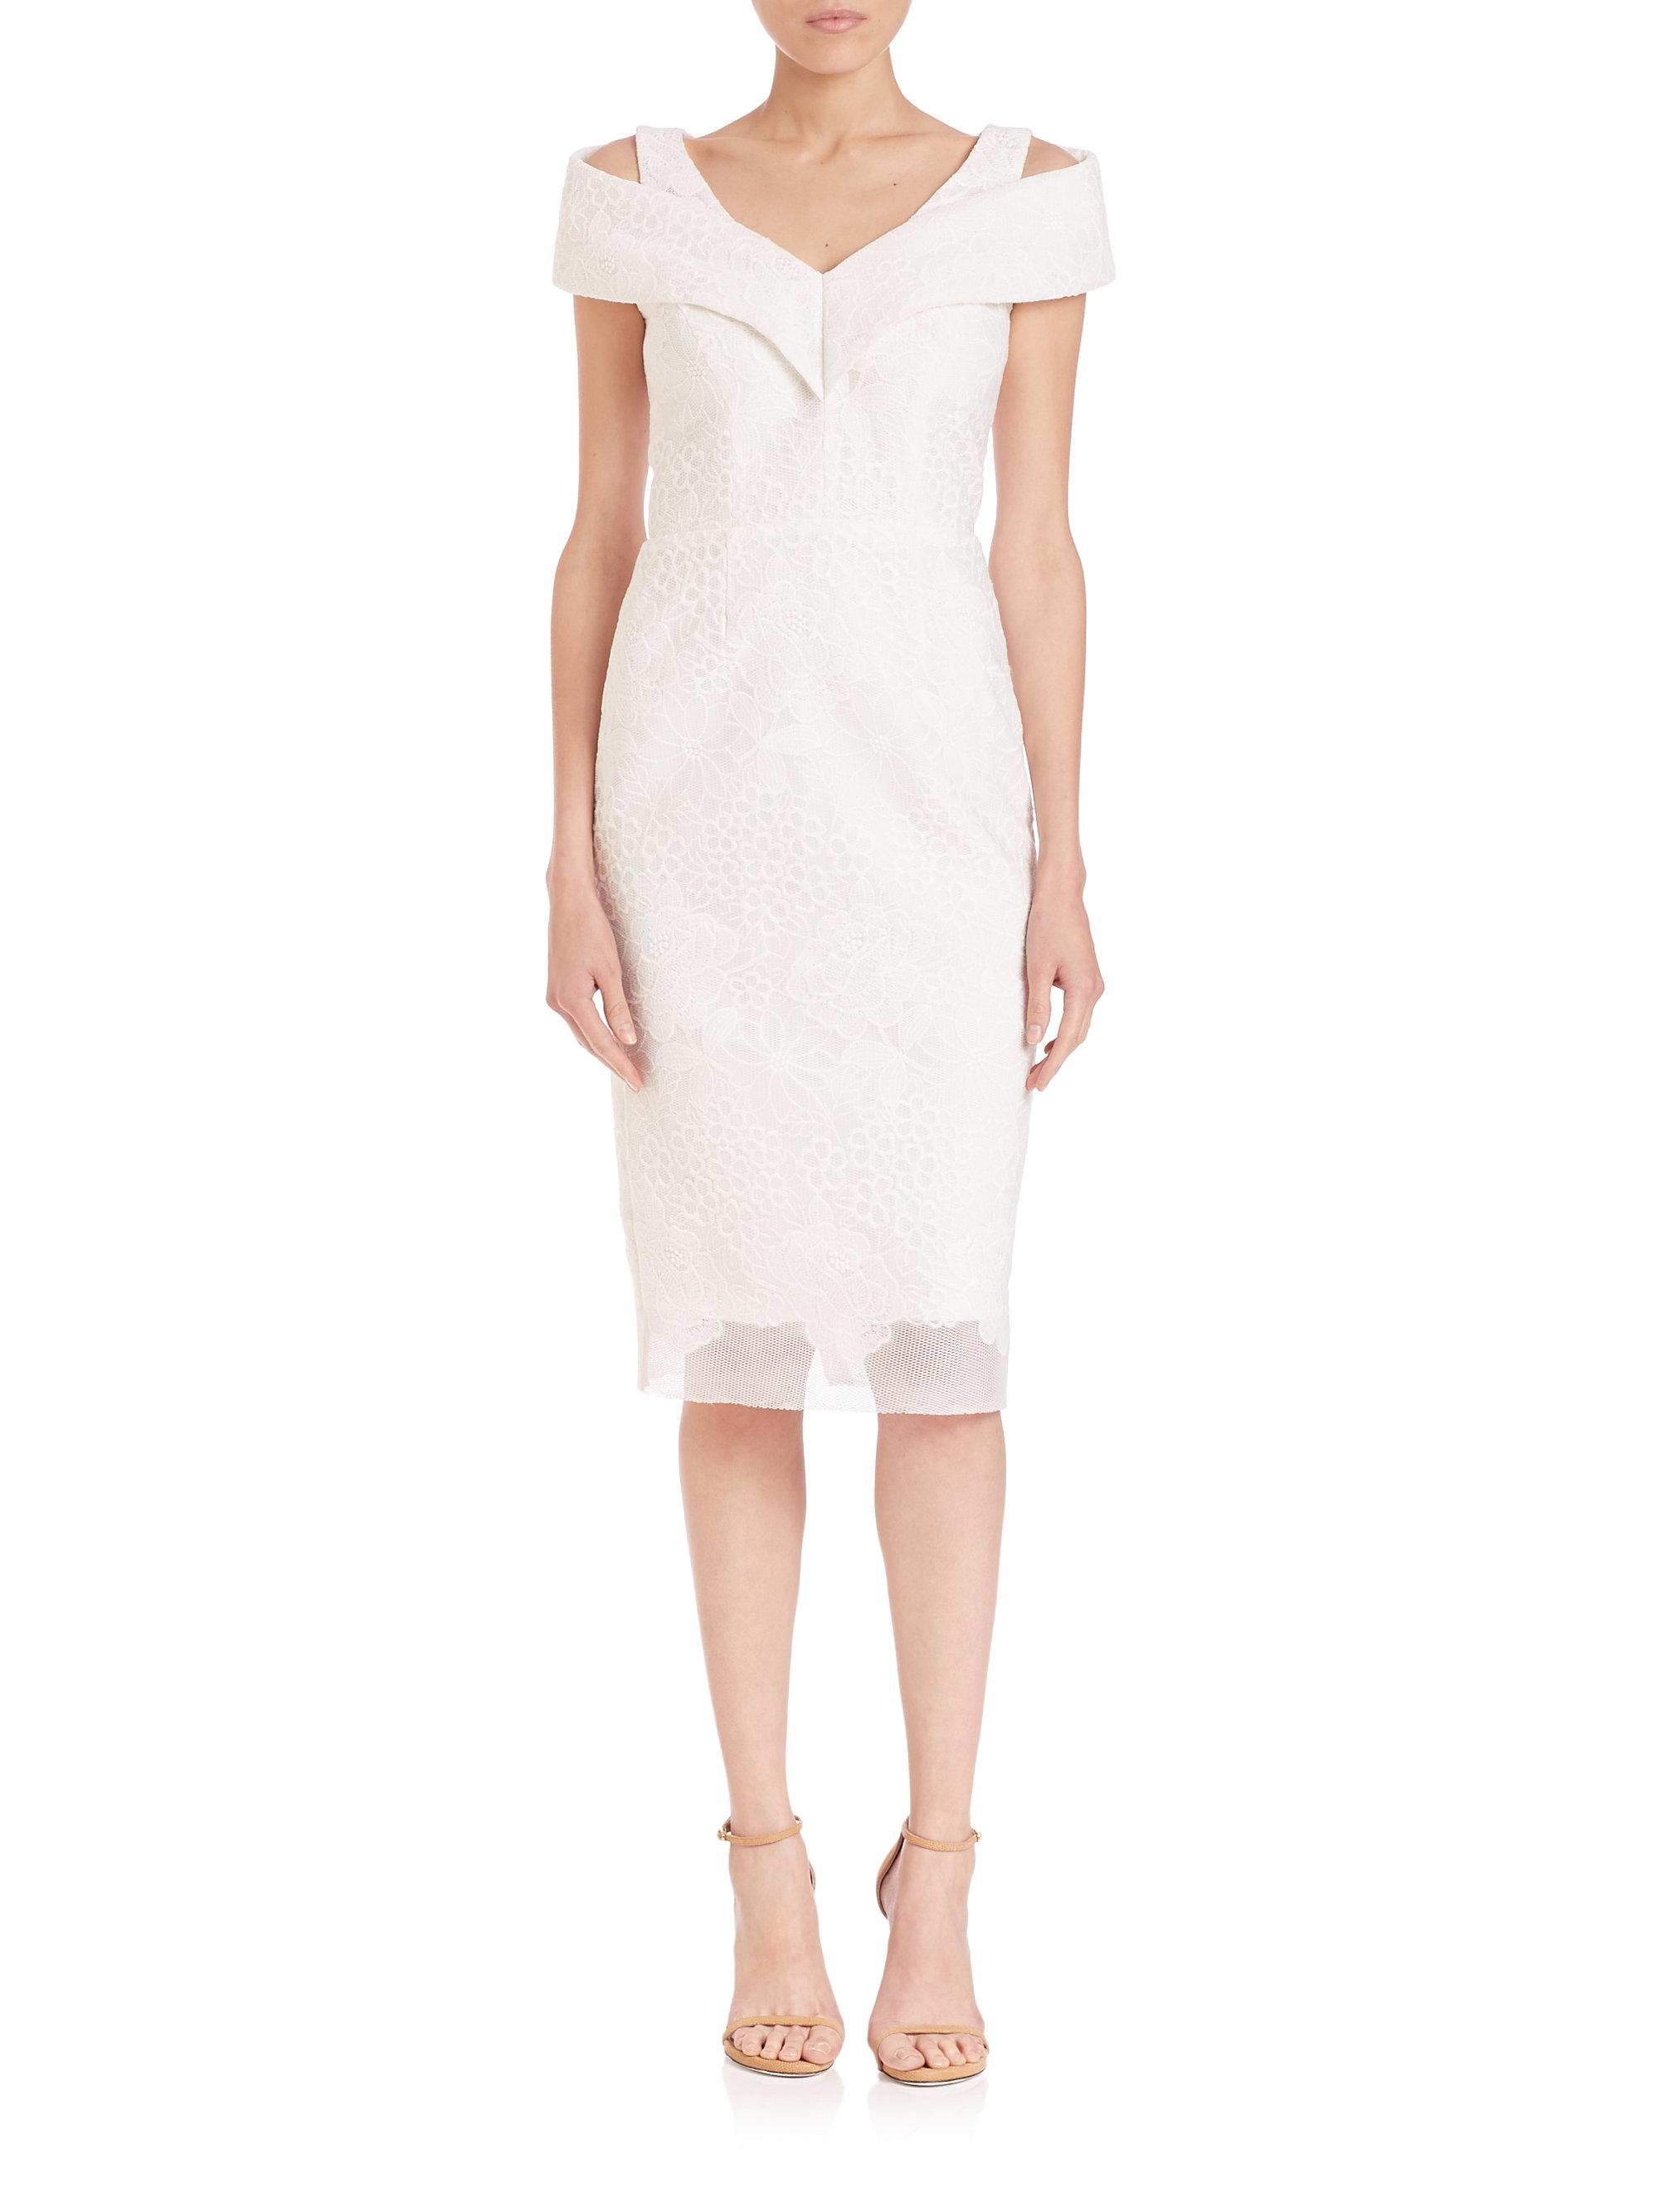 f08e87ac9a6 Lyst - Badgley Mischka Cold-shoulder Lace Sheath Dress in White